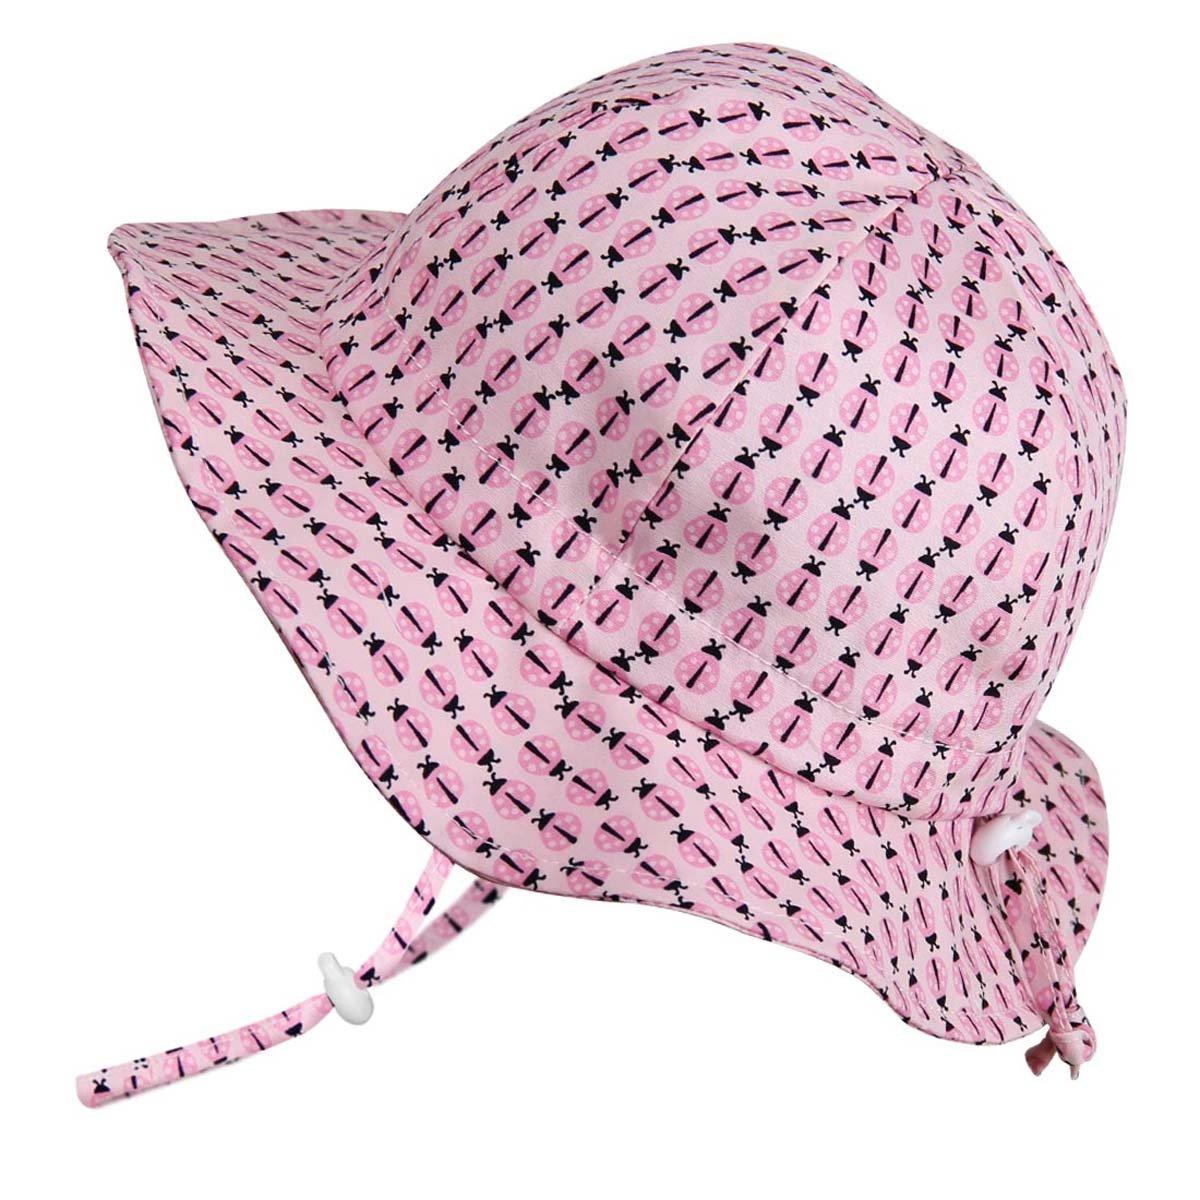 Details about Baby Girl Vintage Bonnet Sun Hat 50 UPF 4262c7eff100